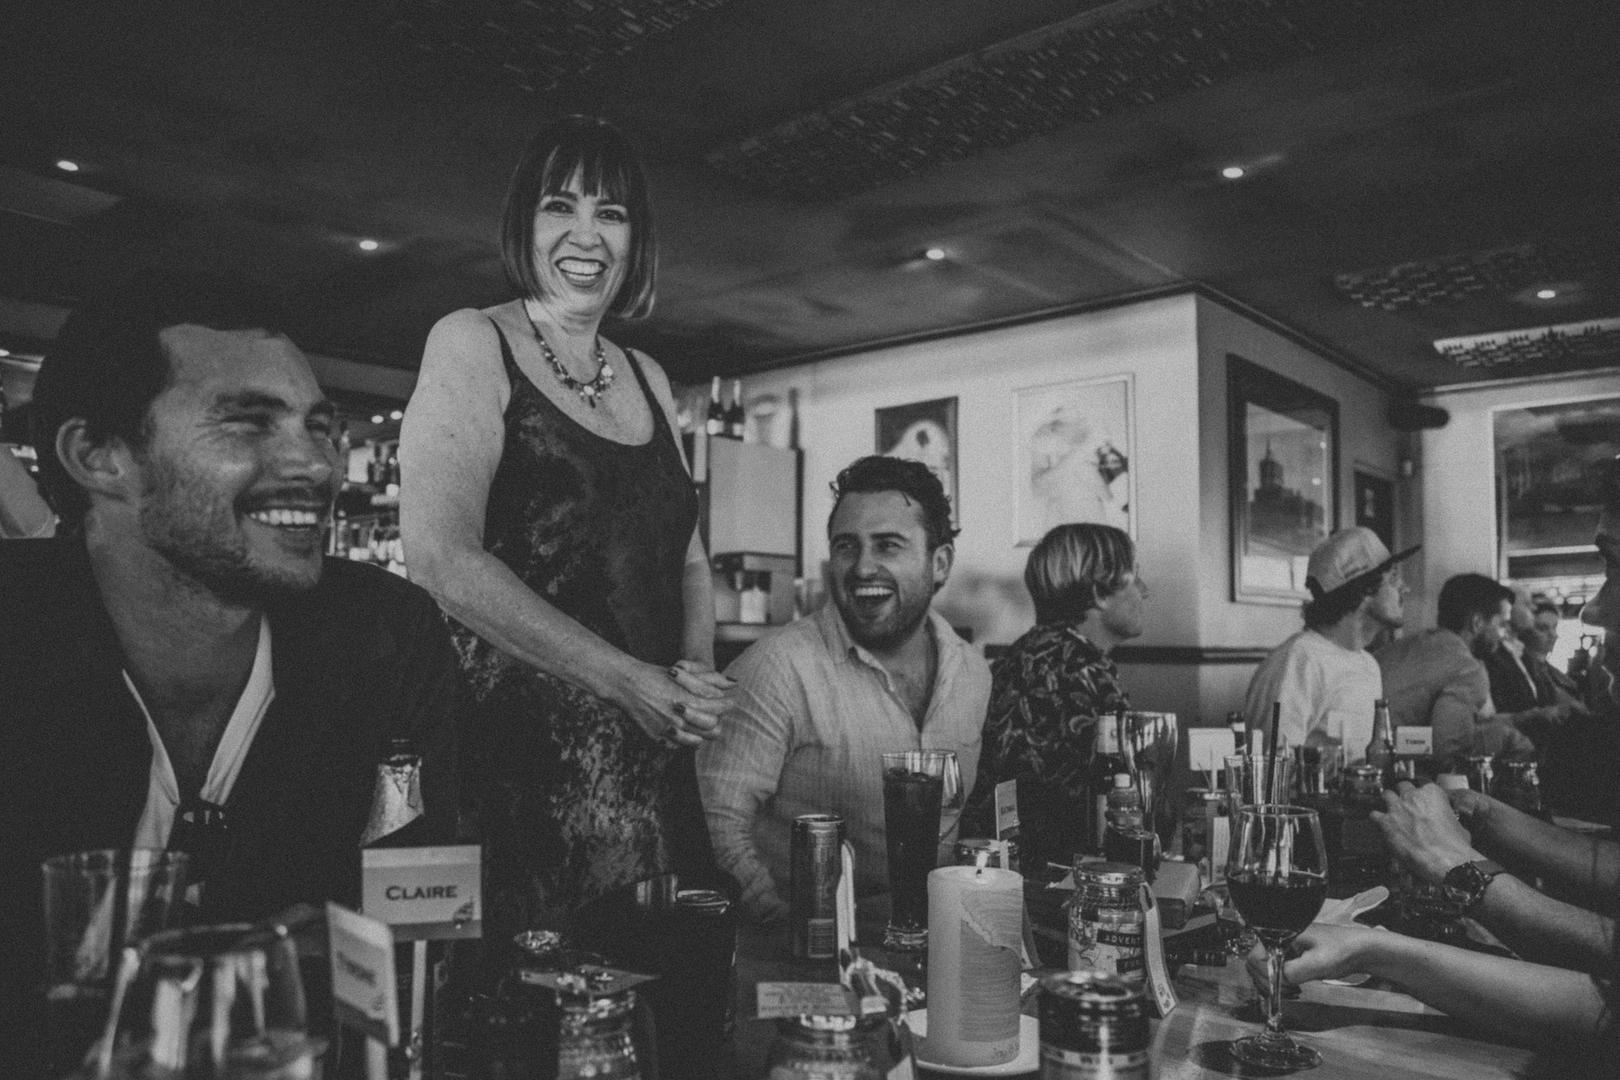 Photographer takes photos at own wedding - Cape Town